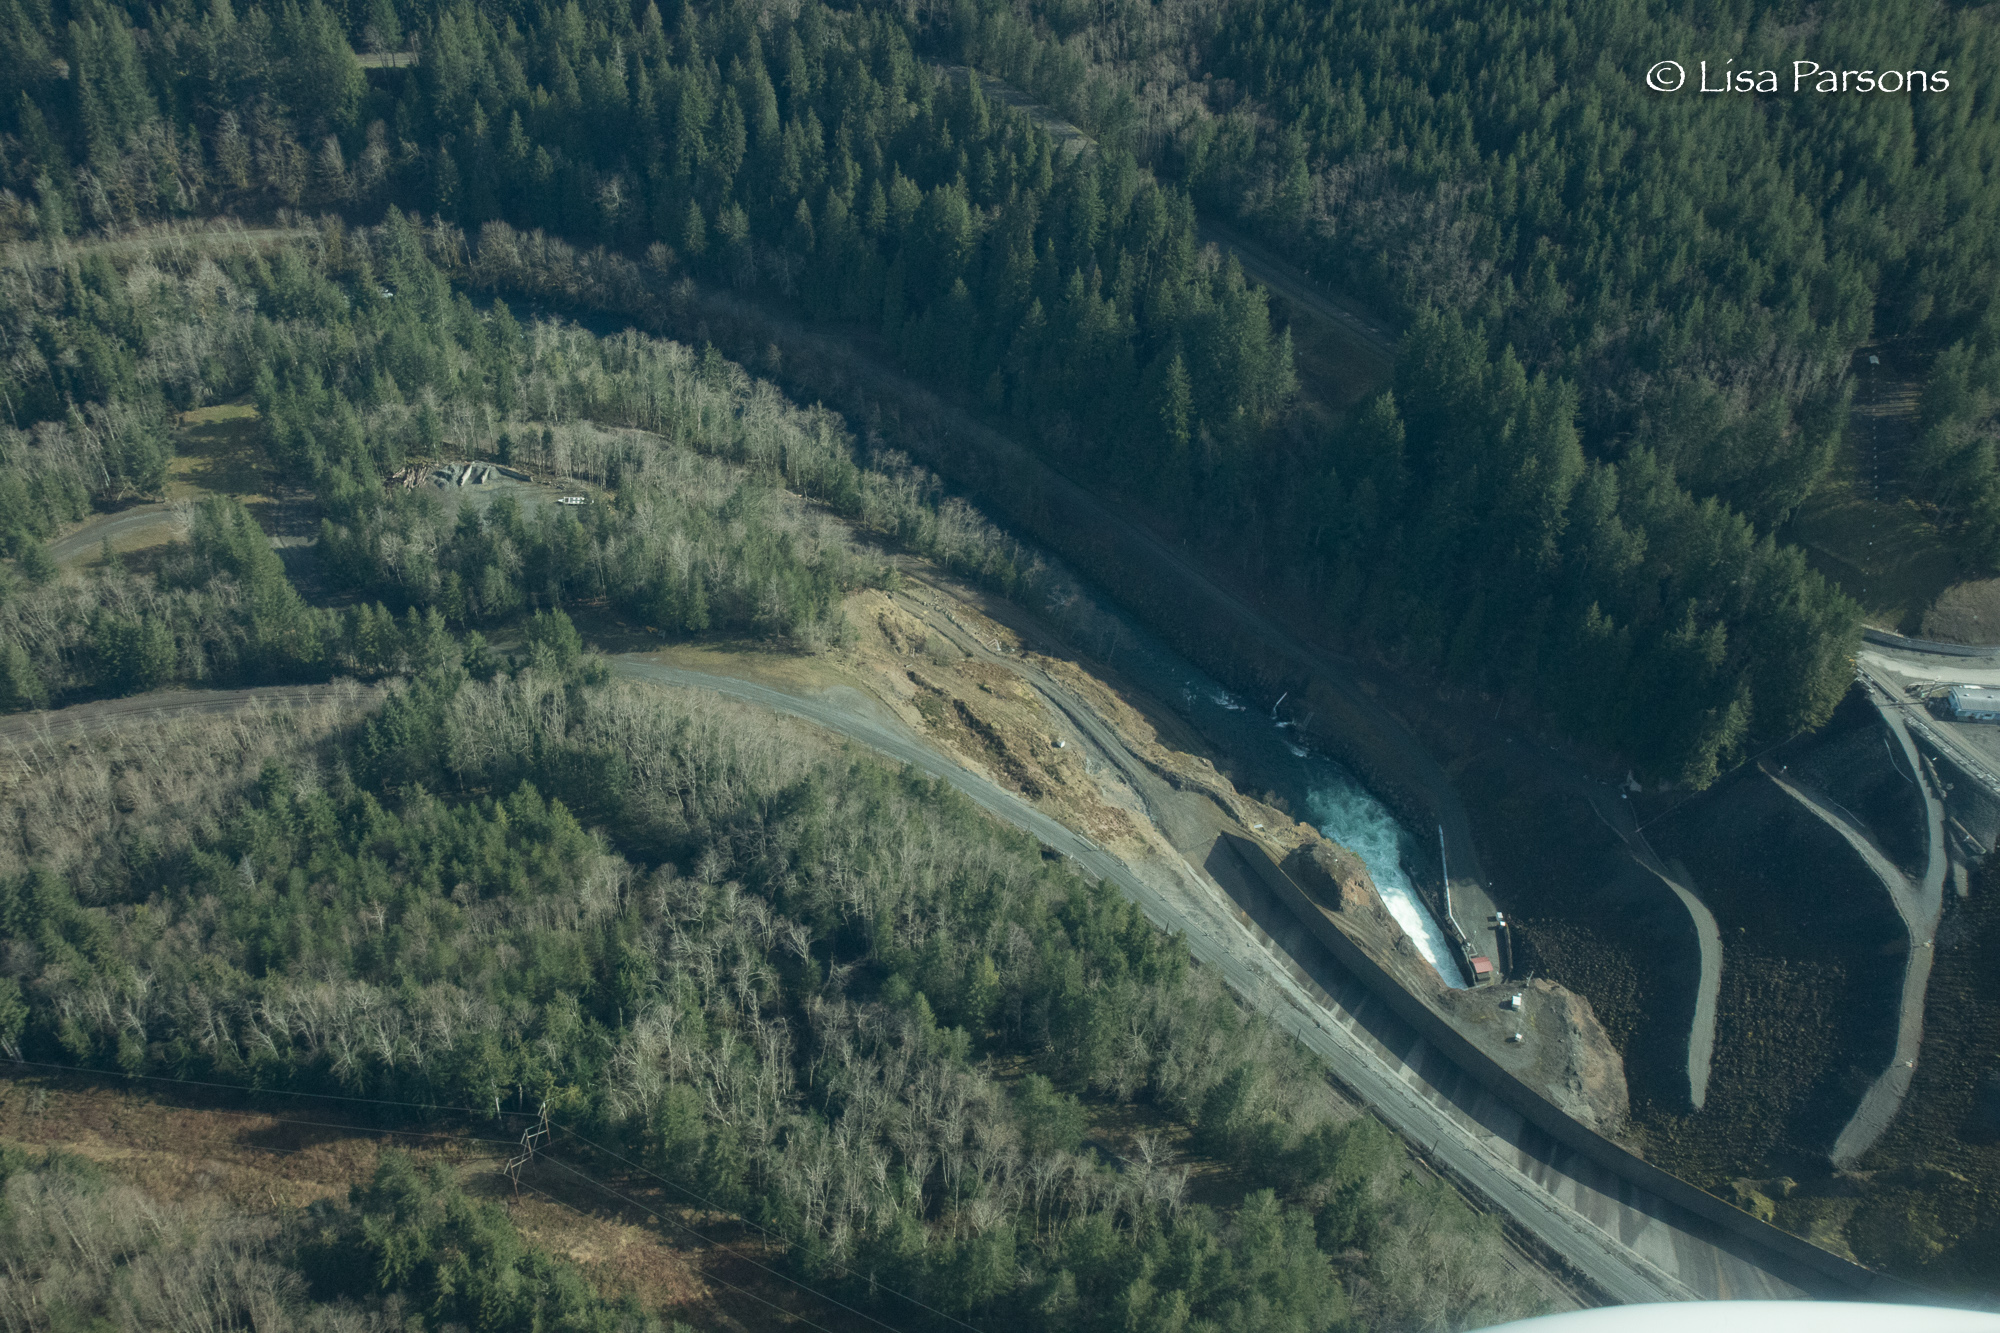 Howard Hanson Earthen Dam